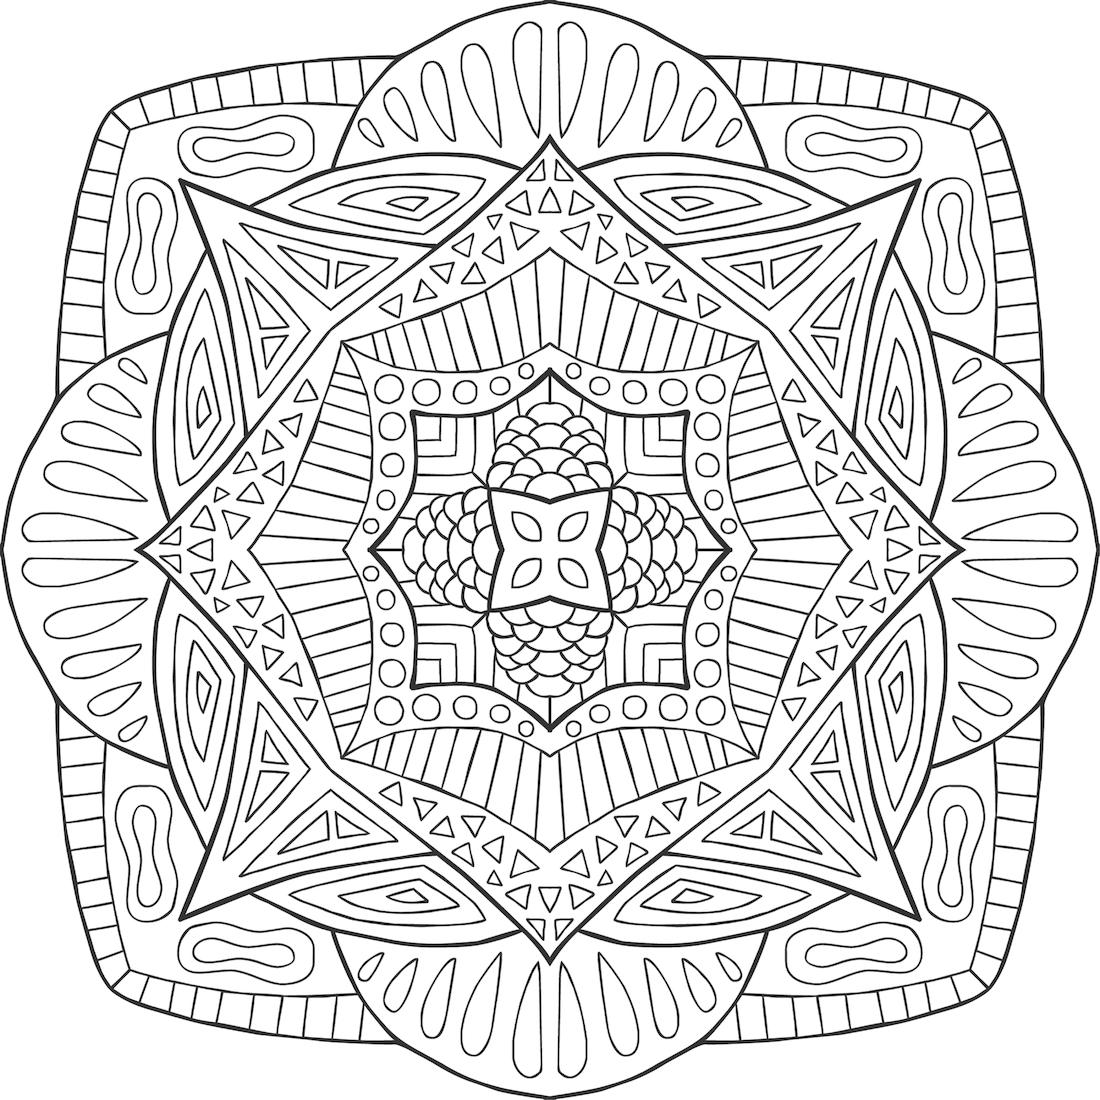 Rupa In Balance Coloring Page  By Hamdi R. - (mondaymandala)